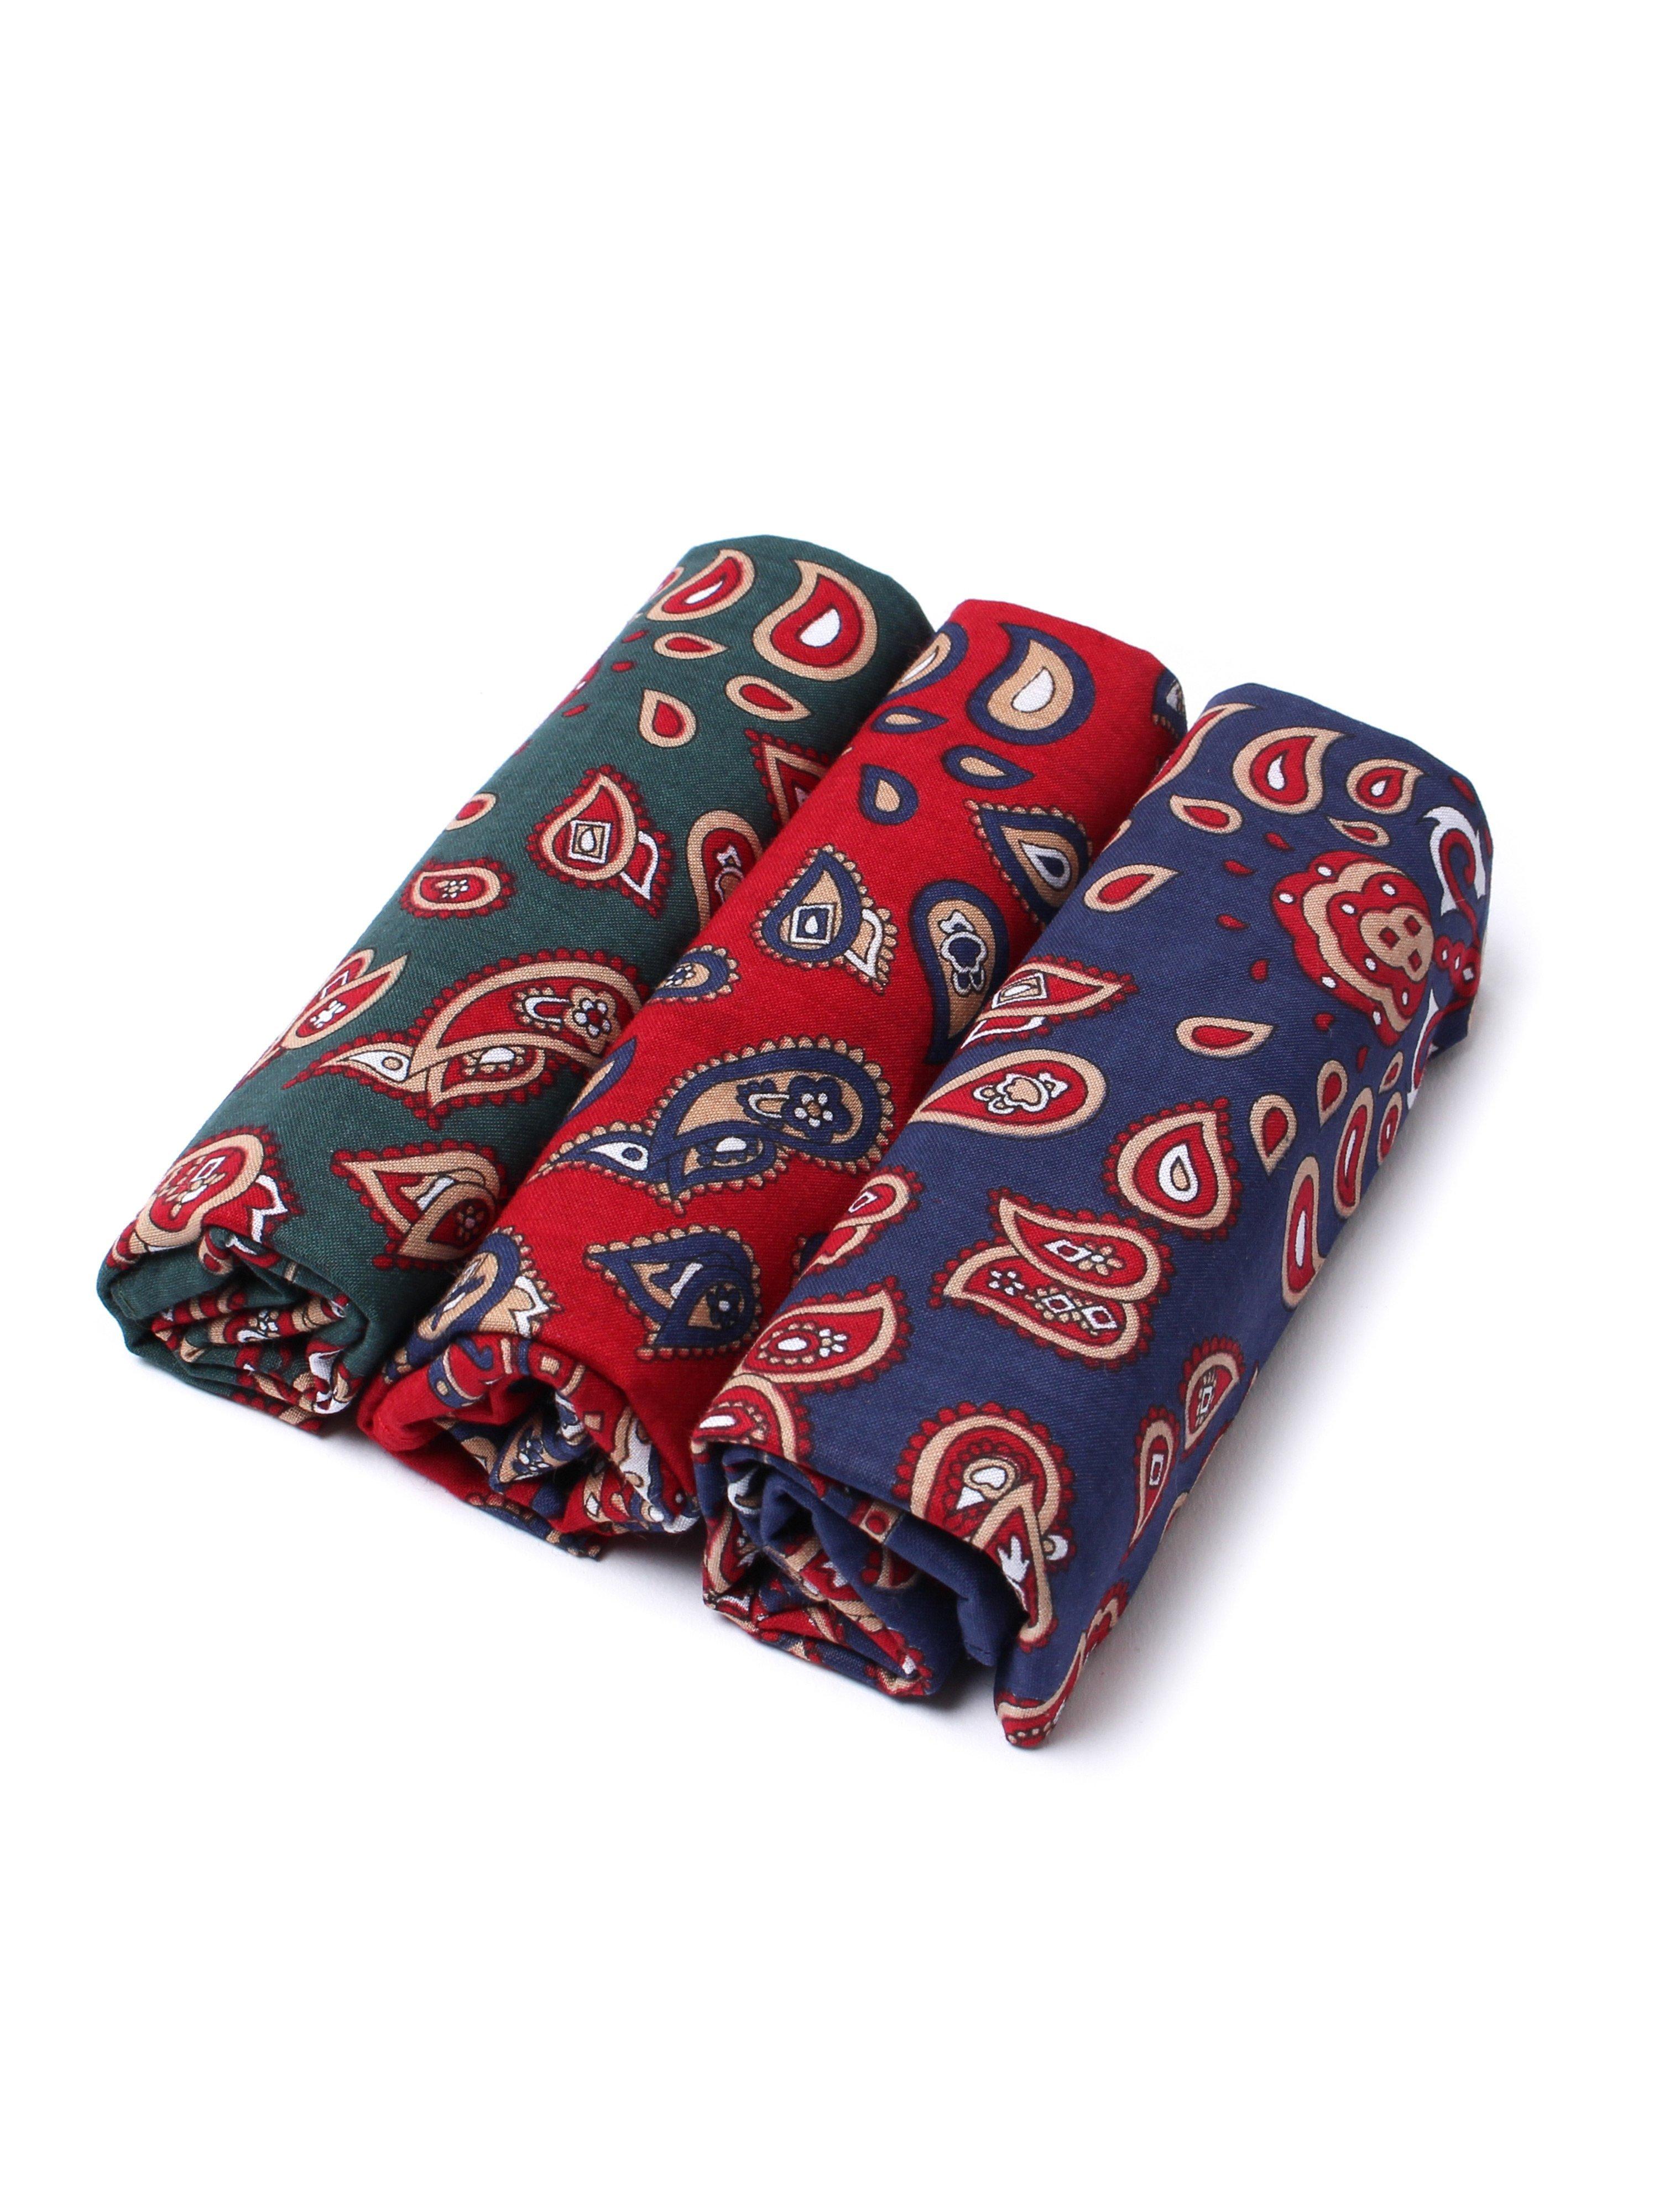 Barbour 3 Pack Paisley Cotton Handkerchiefs - Red, Blue & Green